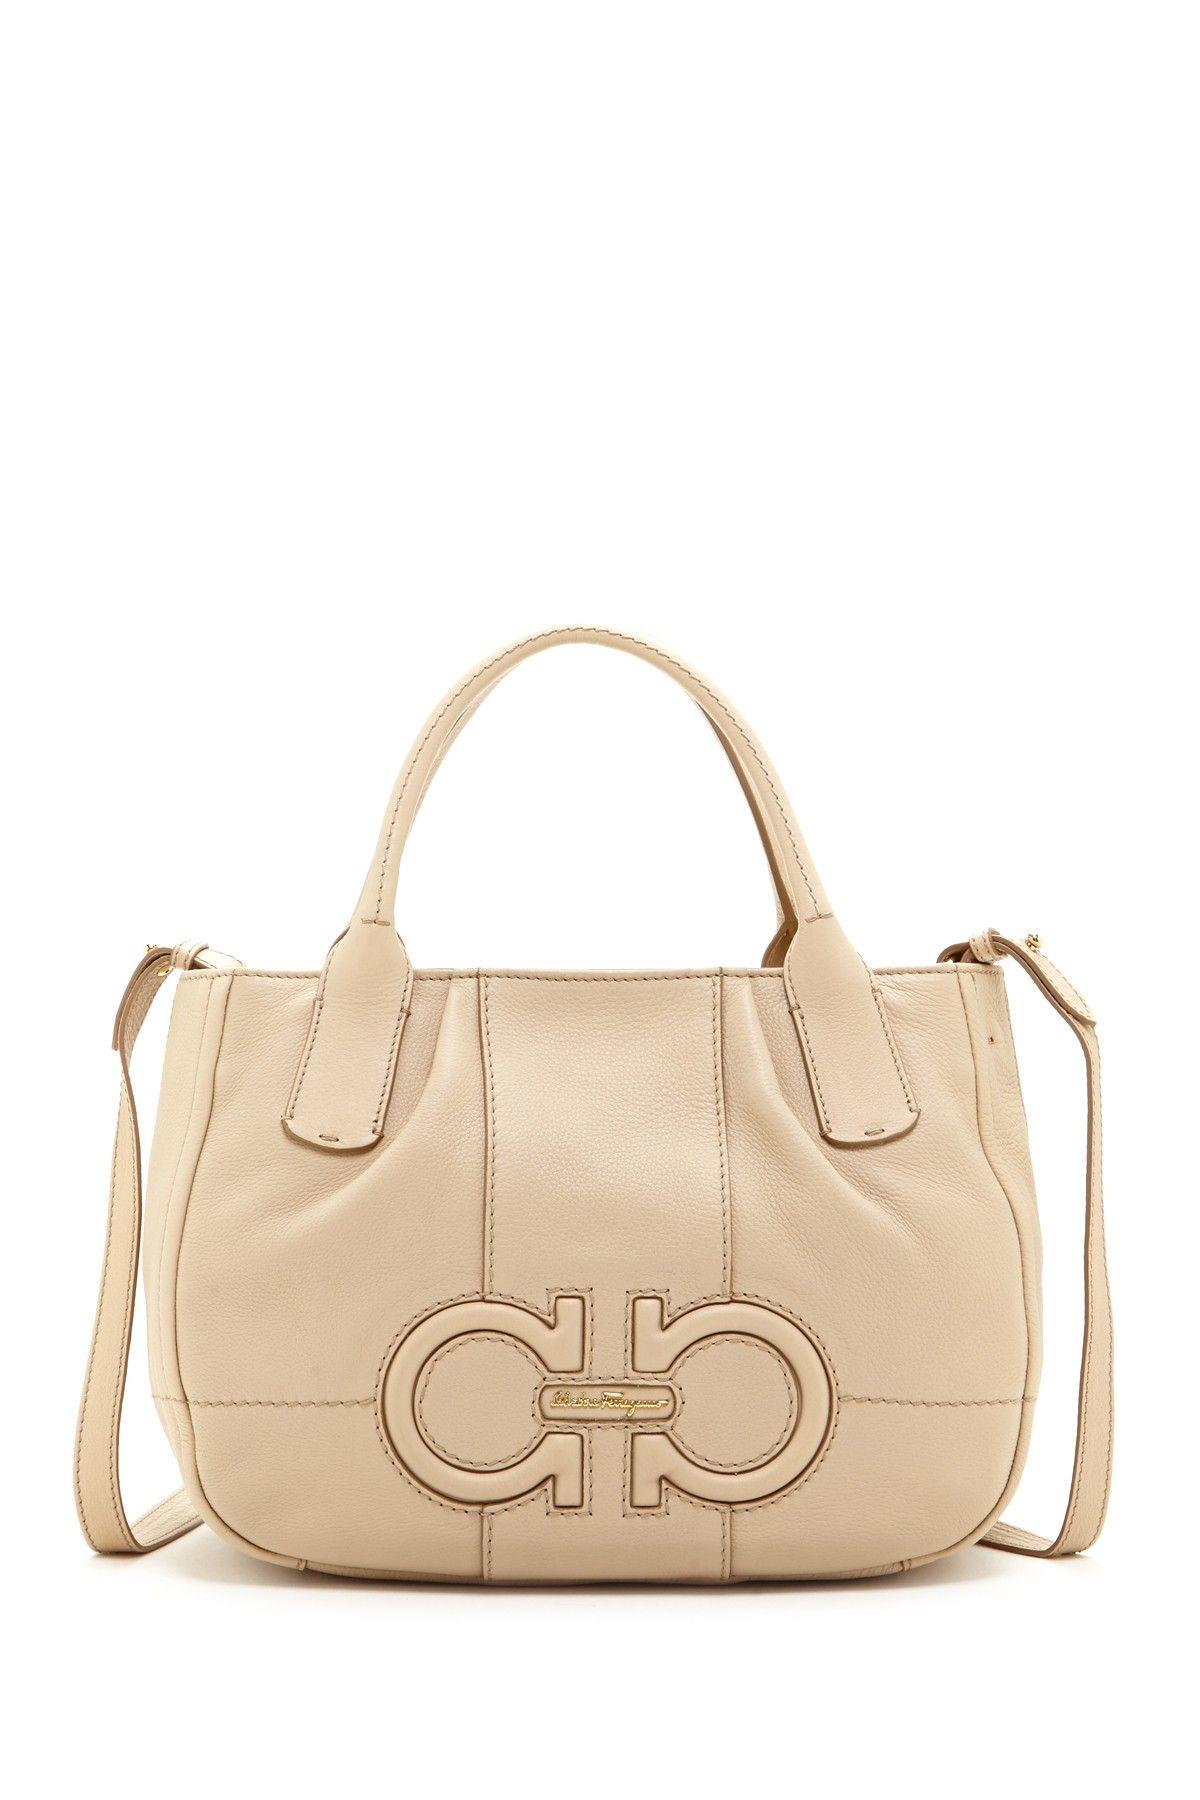 c7e5d9e9d8b Salvatore Ferragamo Handbag @Pascale De Groof | Style & Inspiration ...